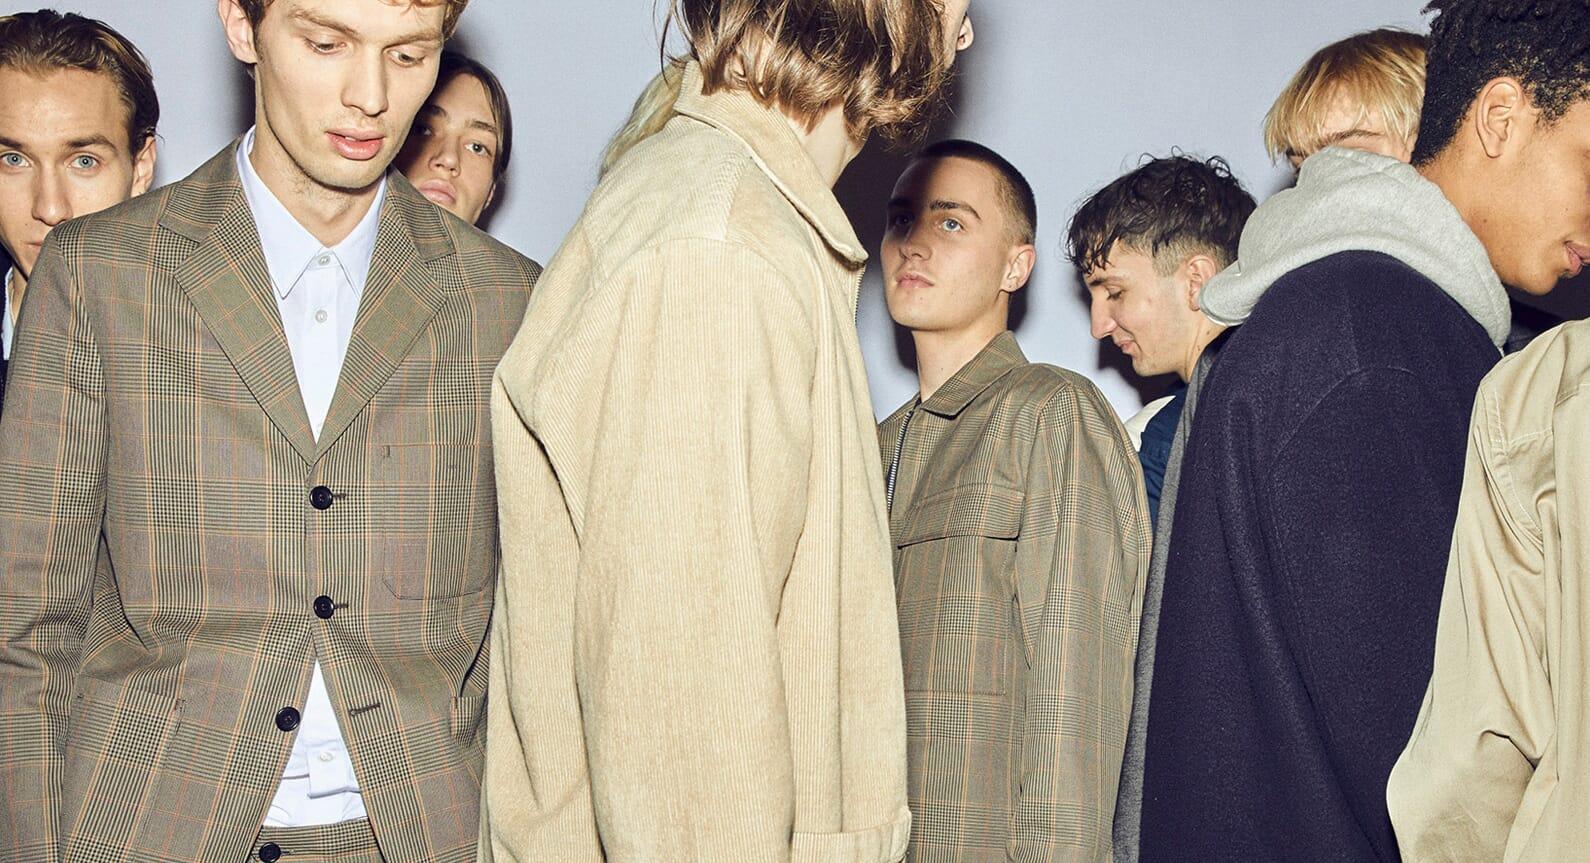 Mfpen Puts A Twist On Classic Scandinavian Design For 2018